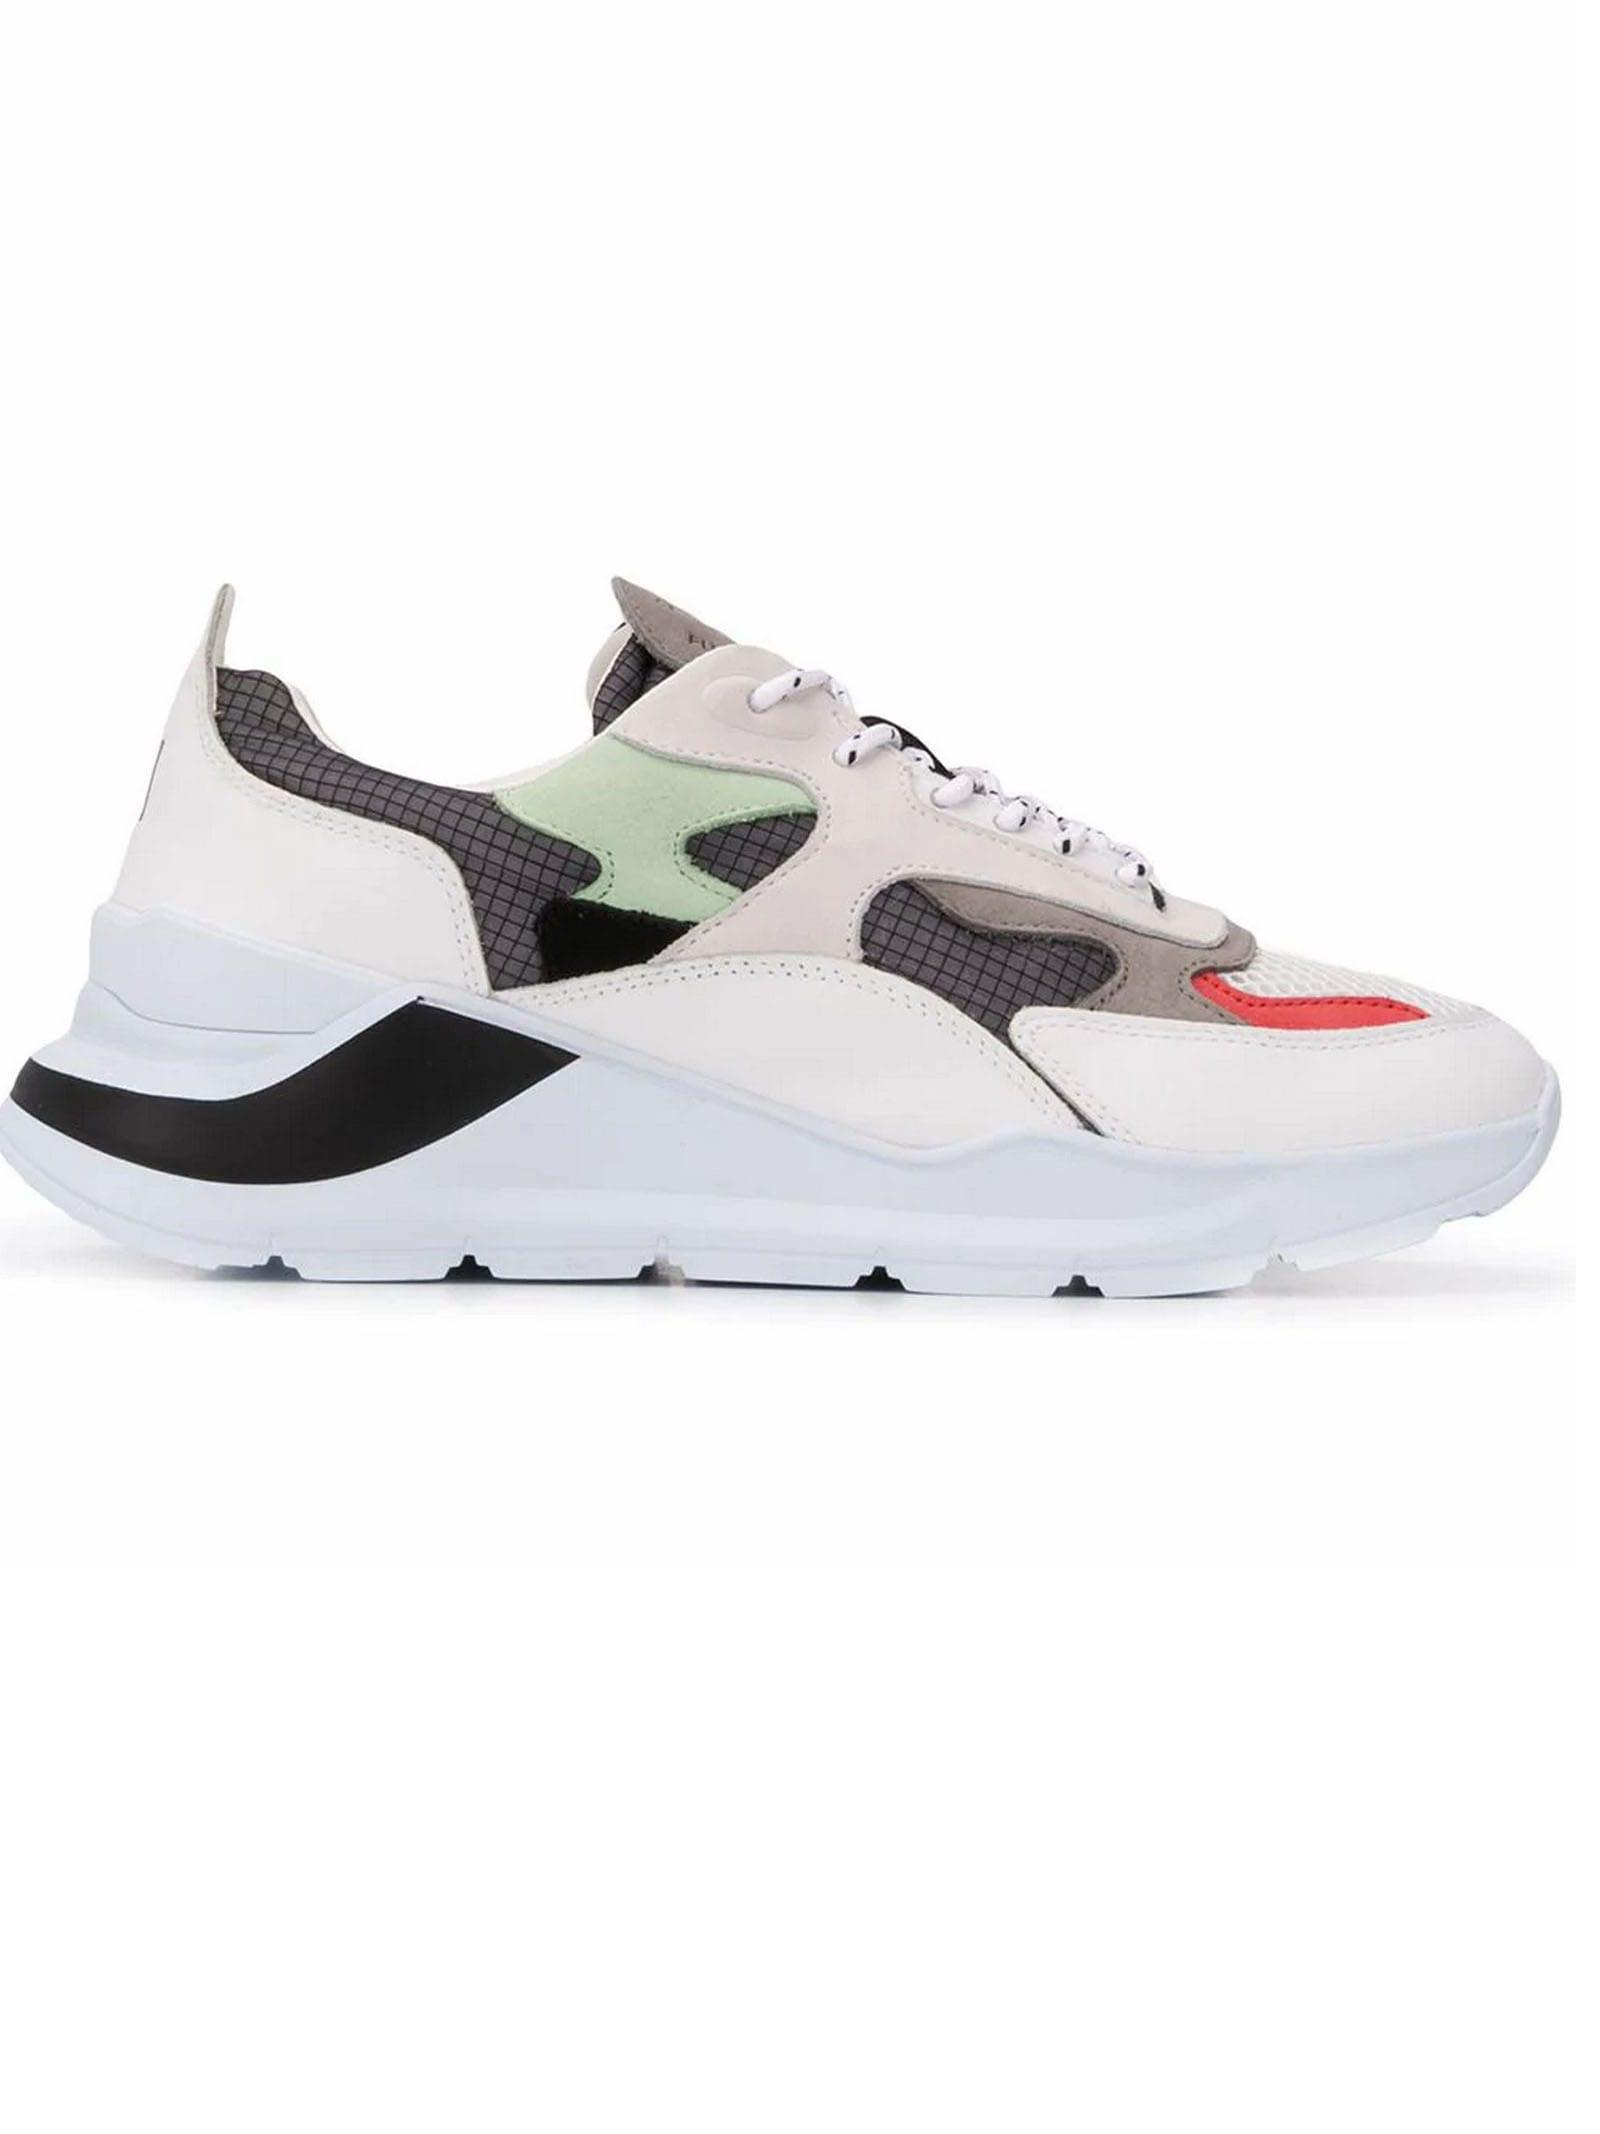 White Leather Fuga Sneakers